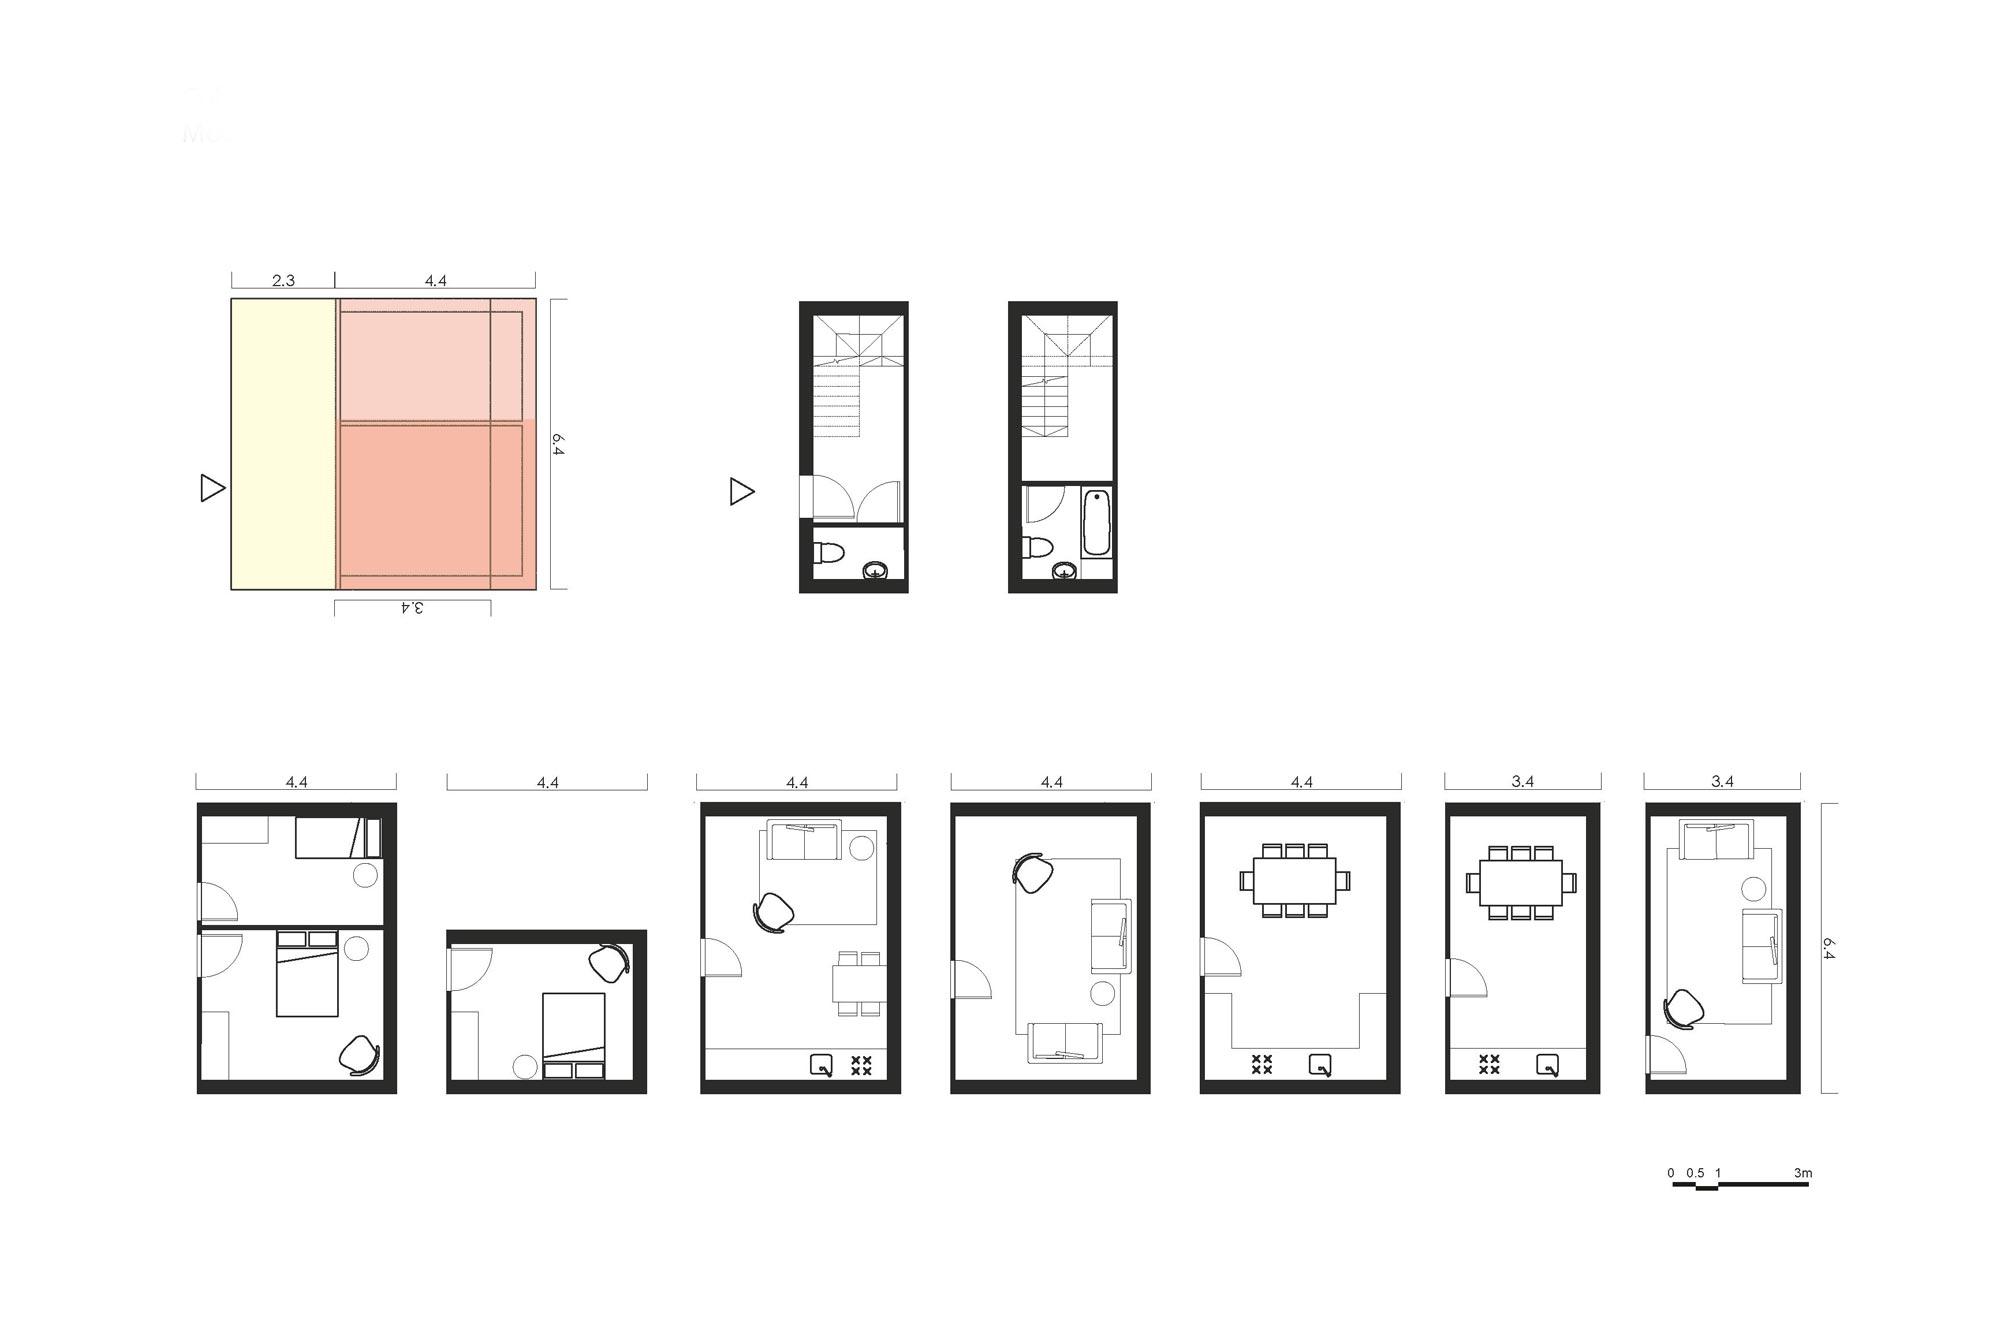 cube-haus-adjaye-associates-architects-cs-2000px-09